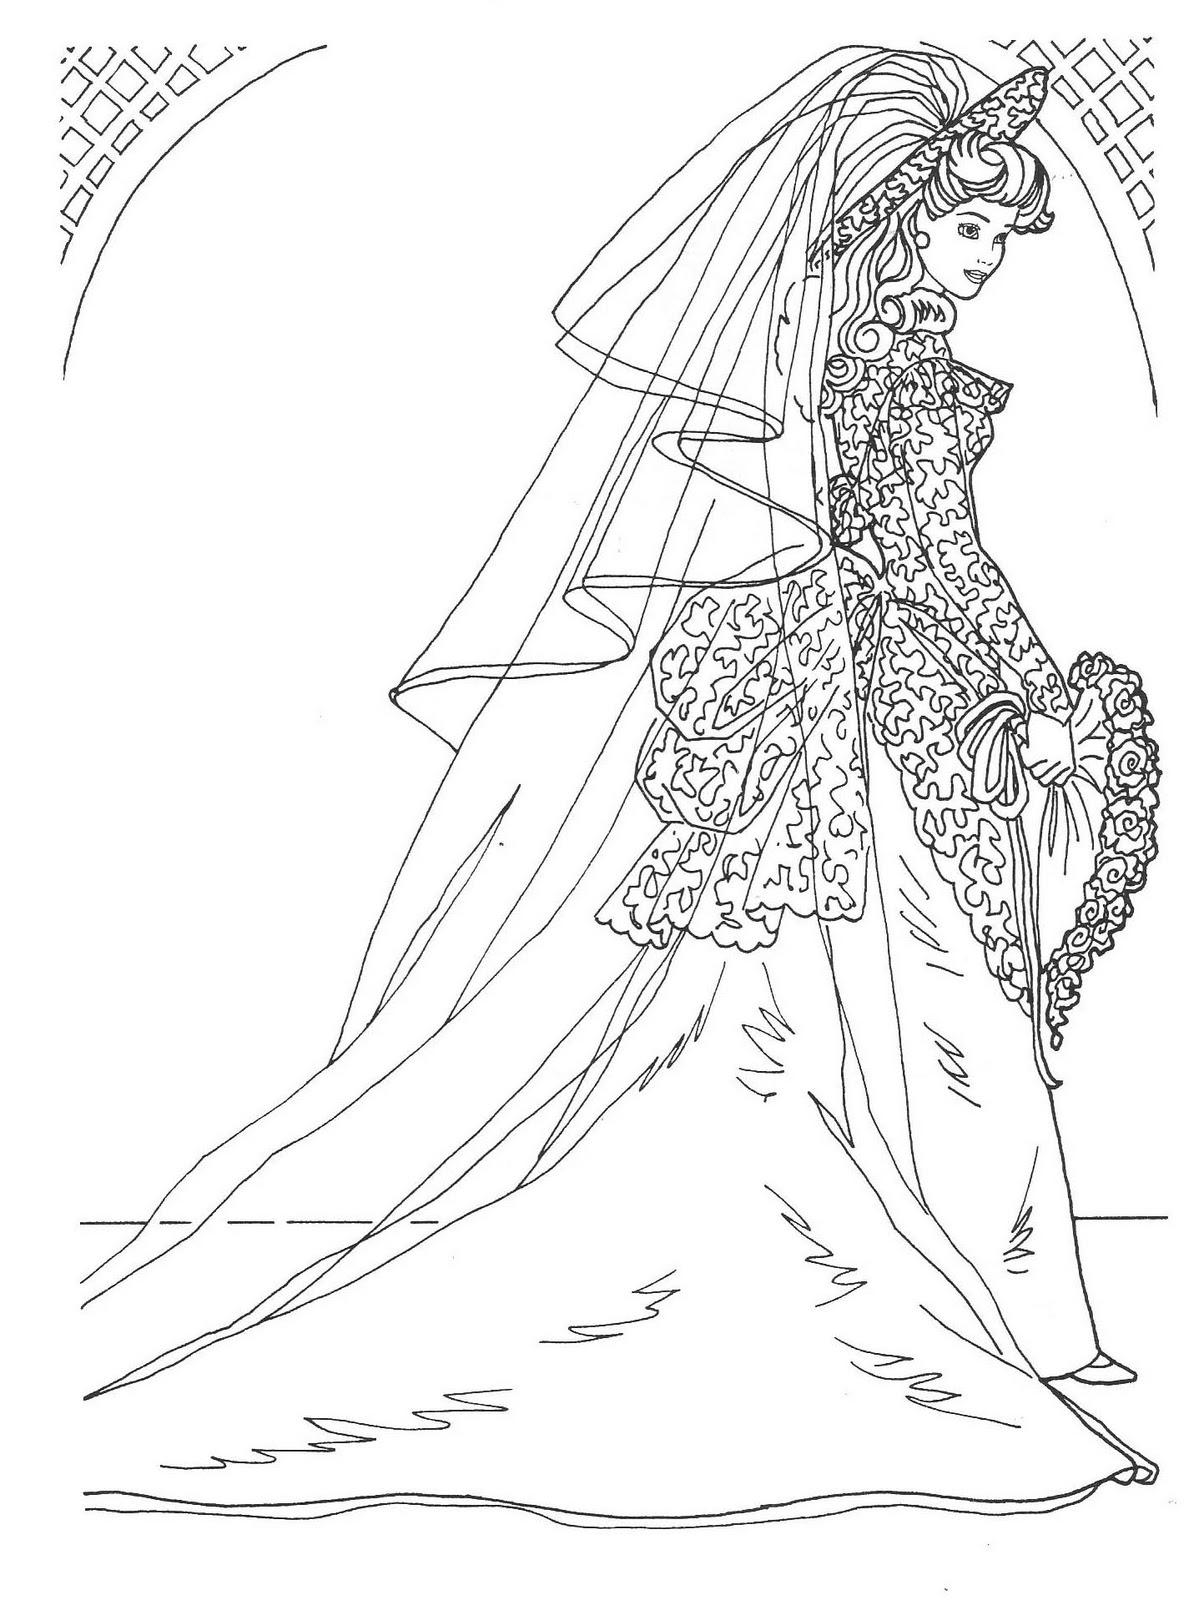 Princess coloring pages blogspot - Princess Coloring Pages Blogspot 49